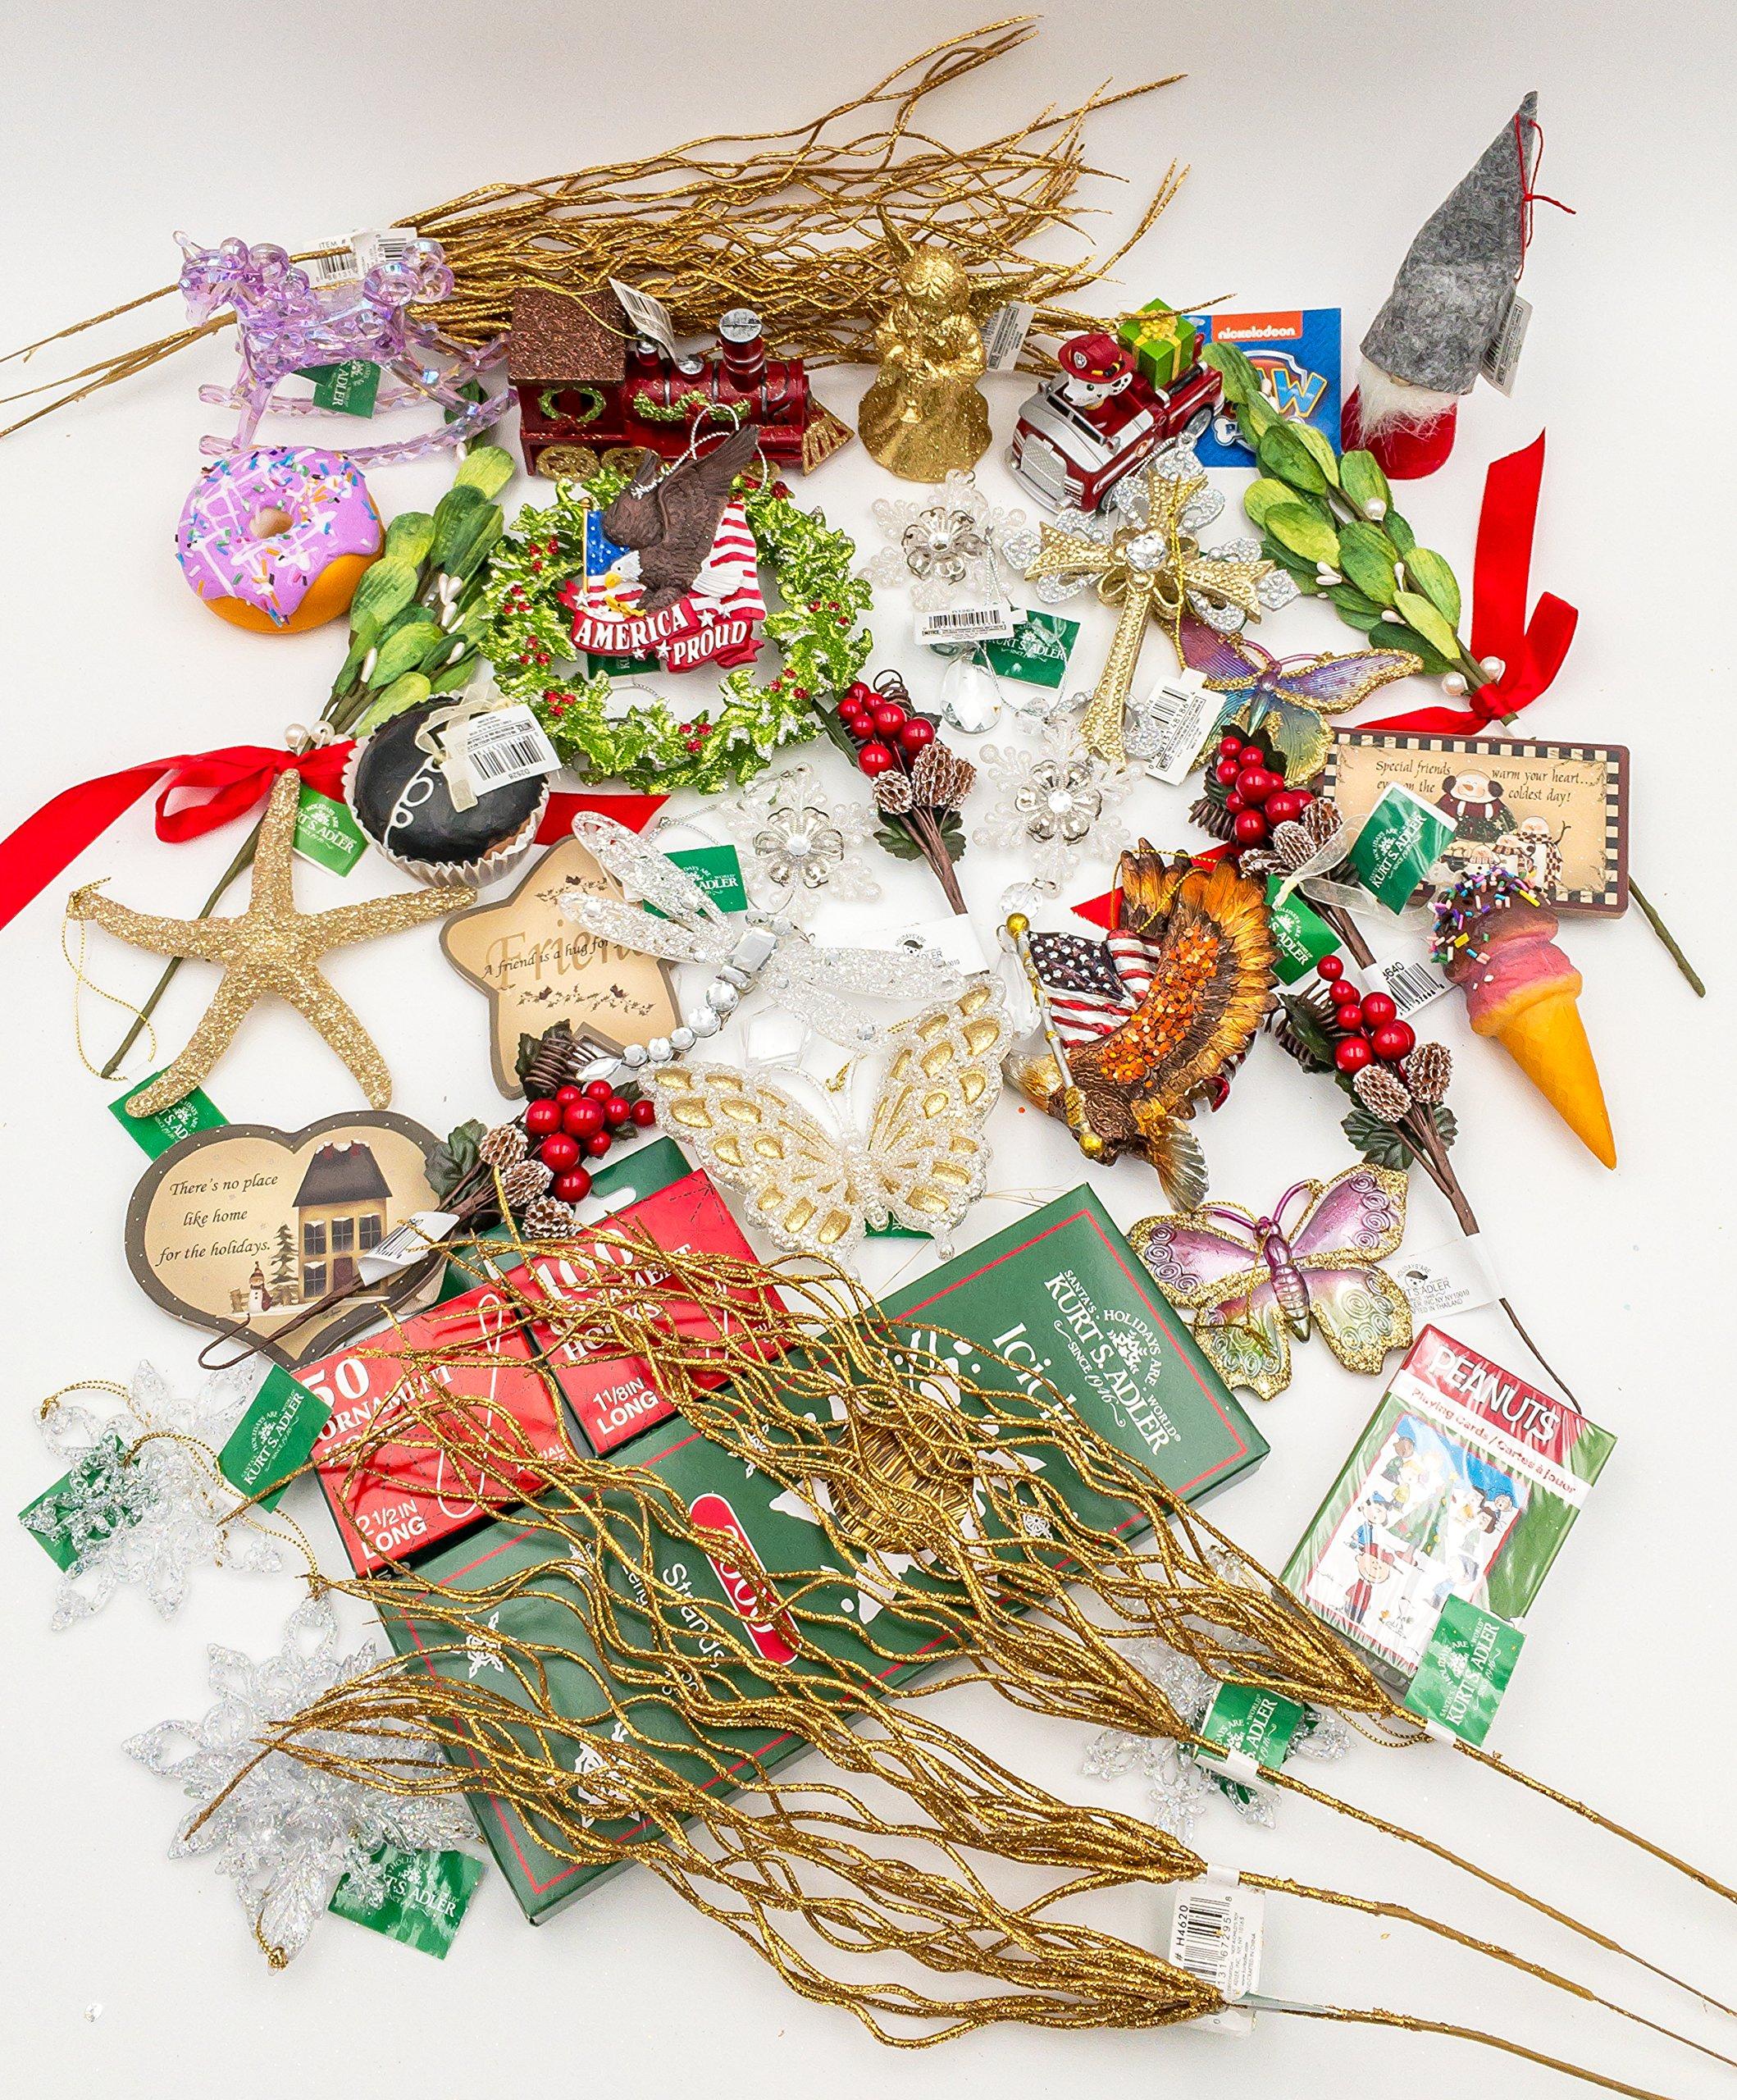 JZ Bundles Starter Set - Best of Christmas Version B - Kurt Adler - 43-Piece Bundle - A Bundle of Christmas Ornaments Great Gift